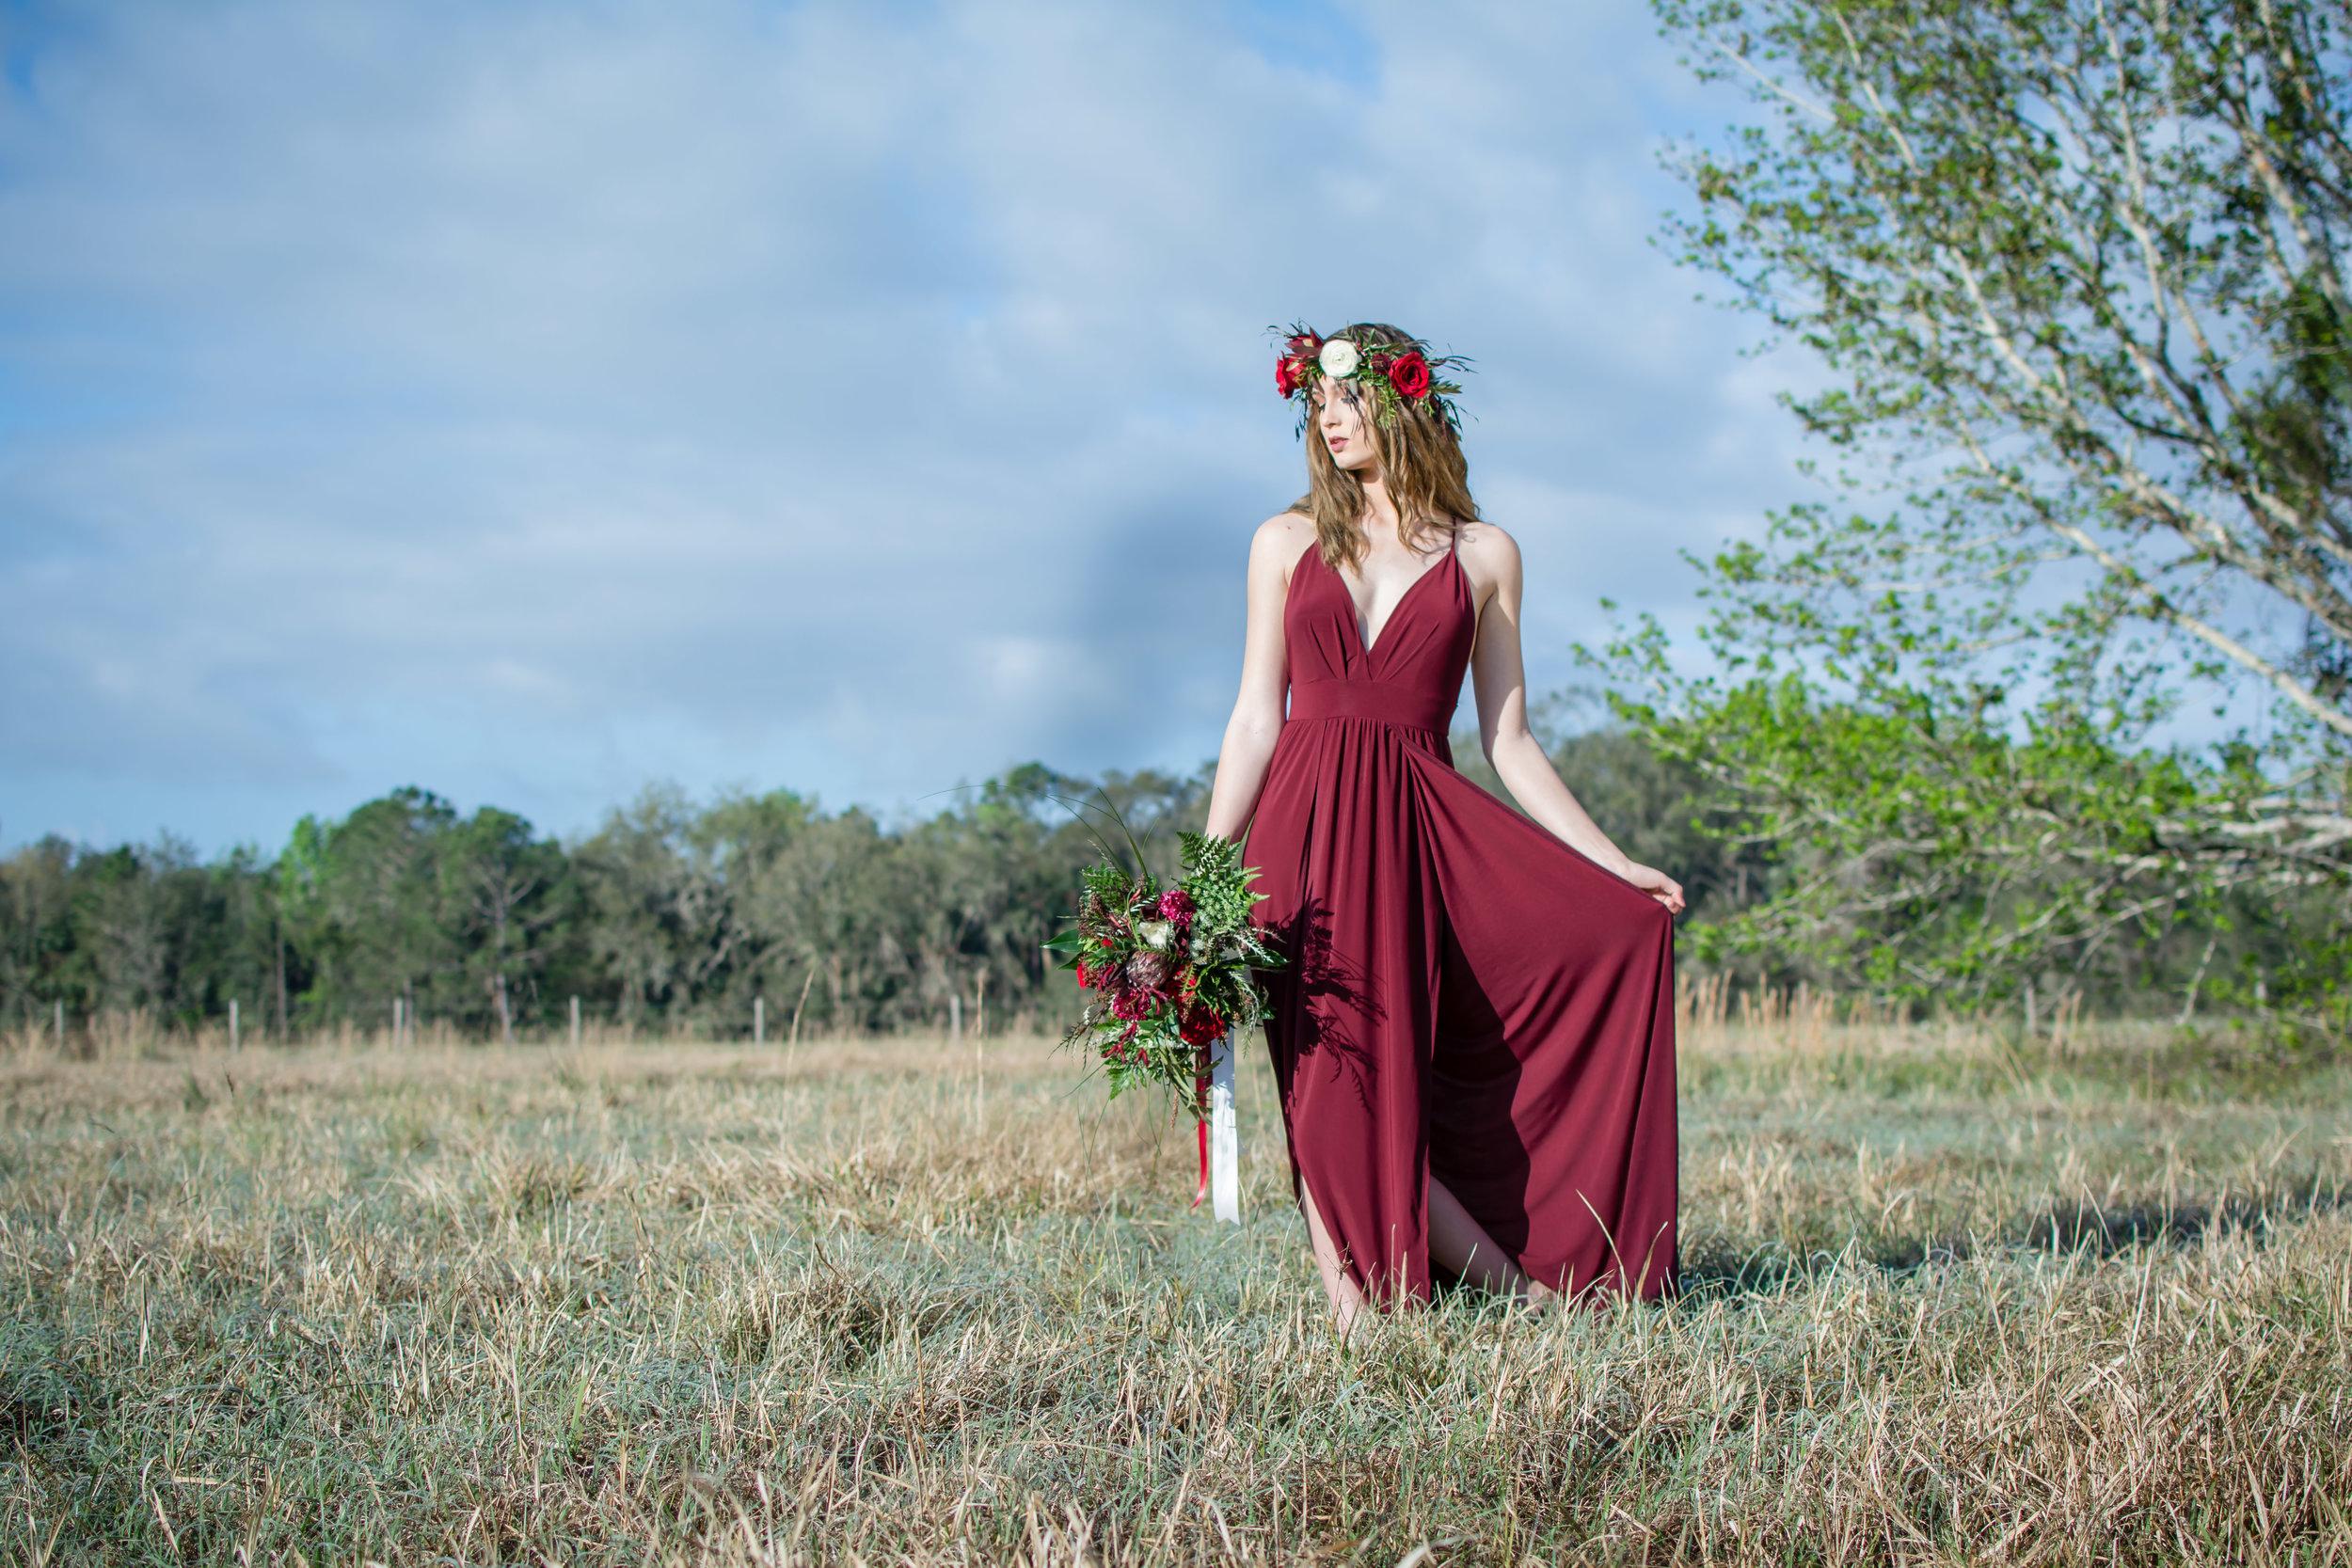 whimsical-bridal-inspiration-fashion-photoshoot-geneva-photographer-yanitza-ninett-1-5.jpg